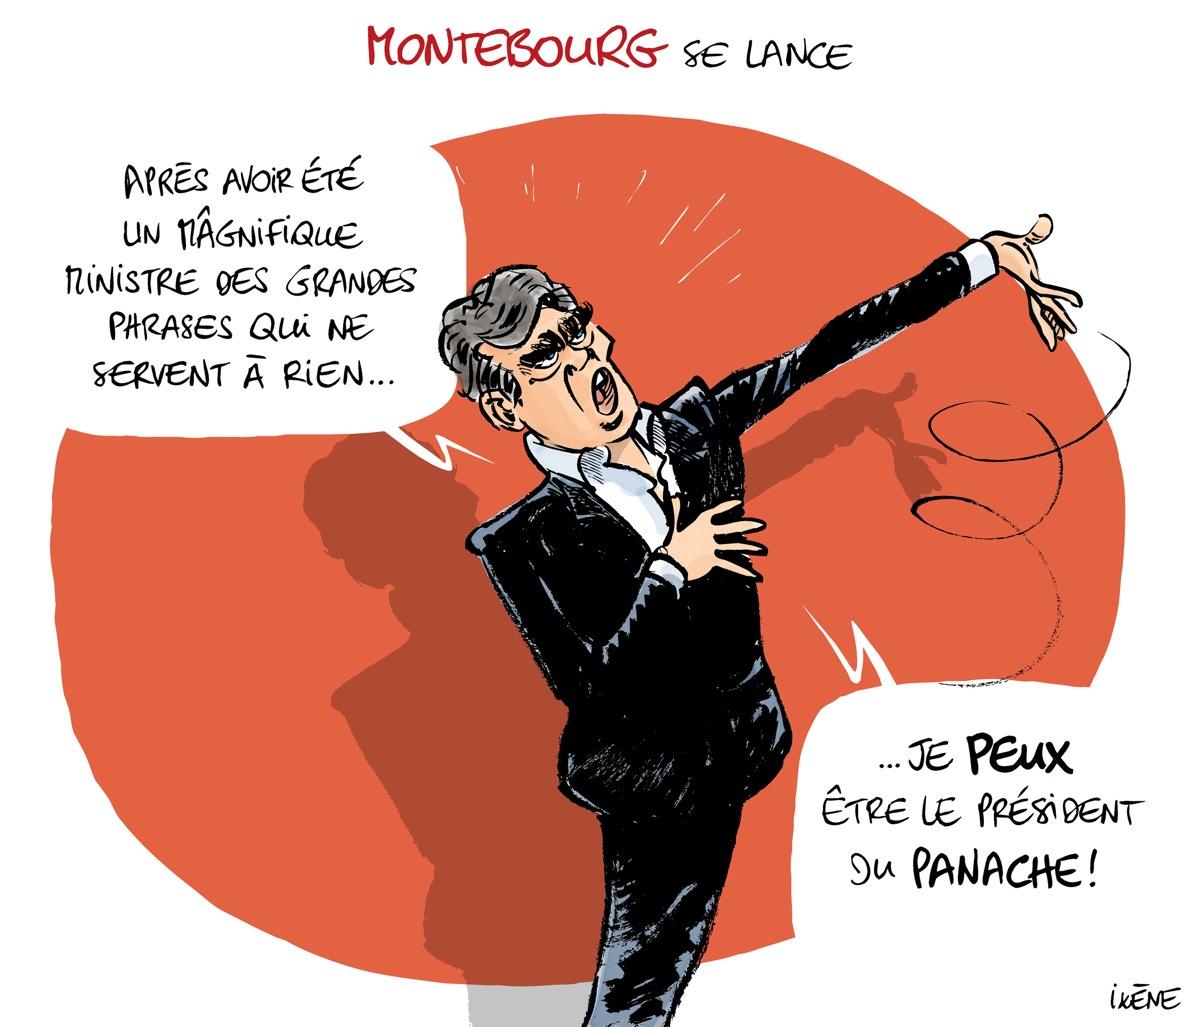 2016 08 22 Montebourg Primaire